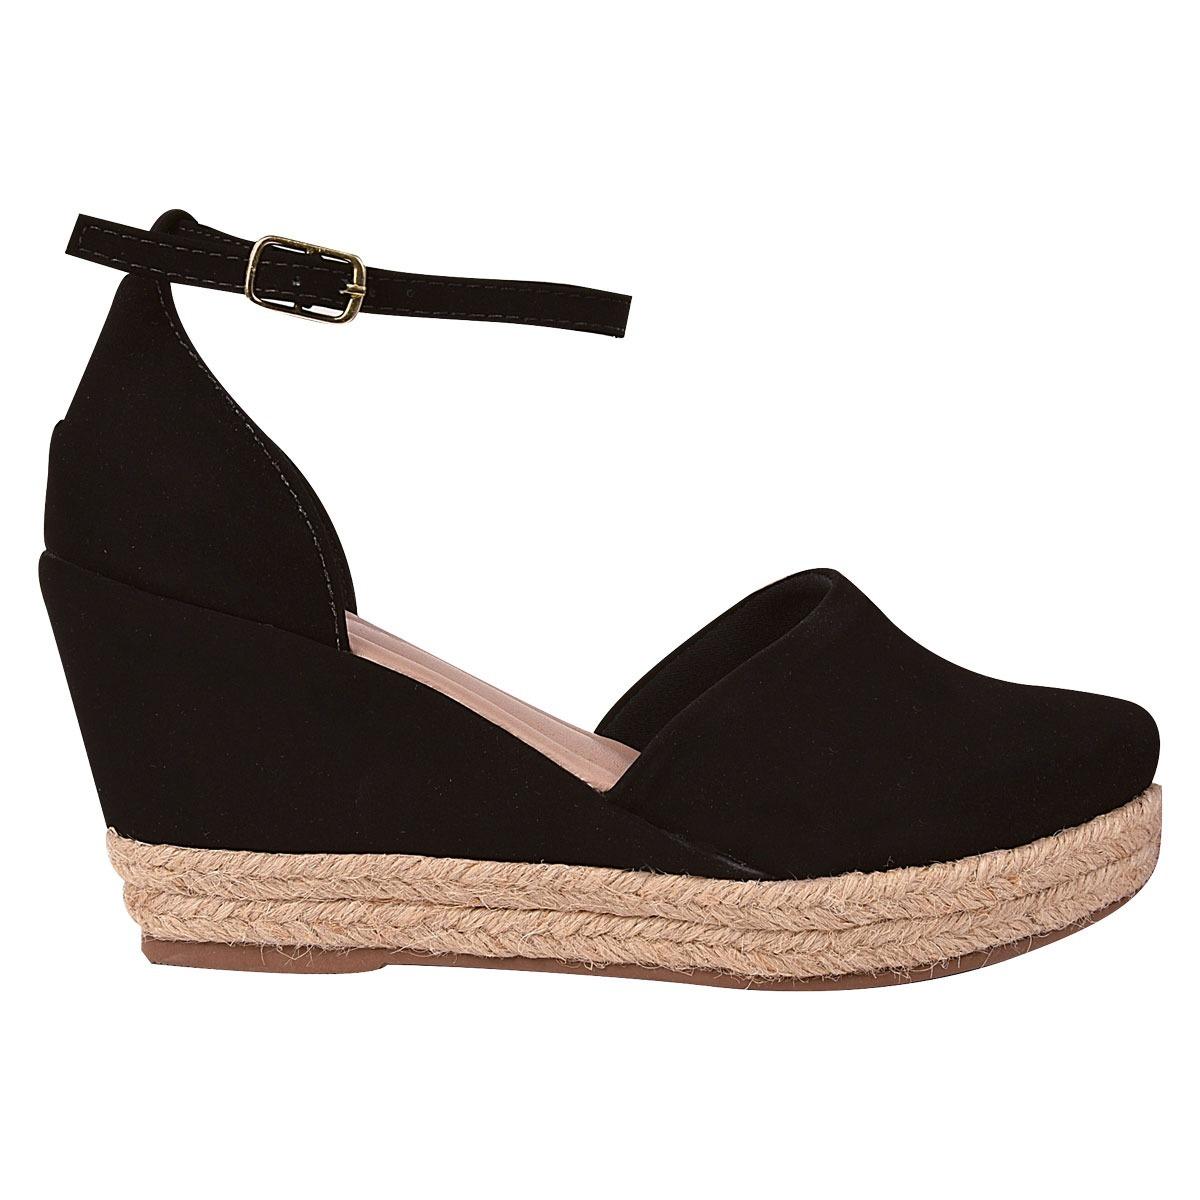 6051772df sandalia sapato feminina anabela salto alto tratorada snp45. Carregando zoom .